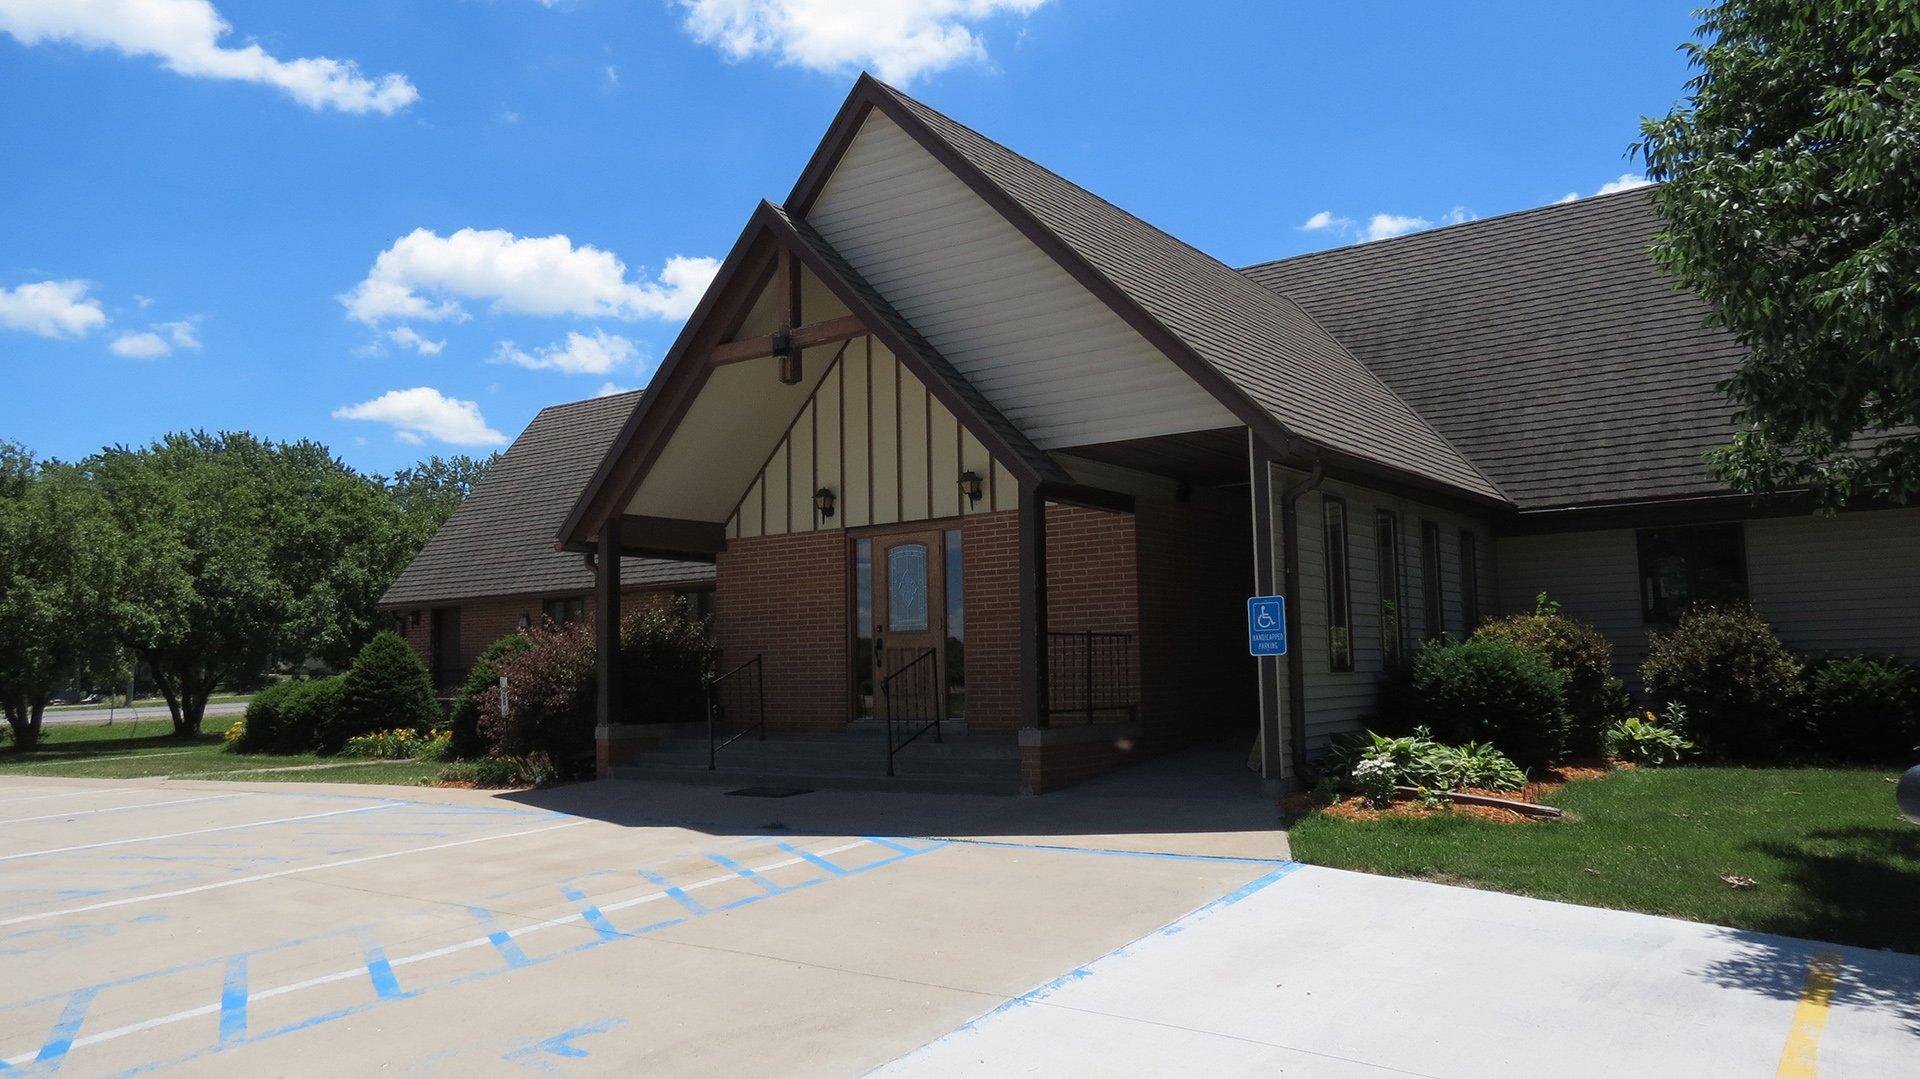 exterior-1-grace-evangelical-lutheran-oskaloosa.jpg